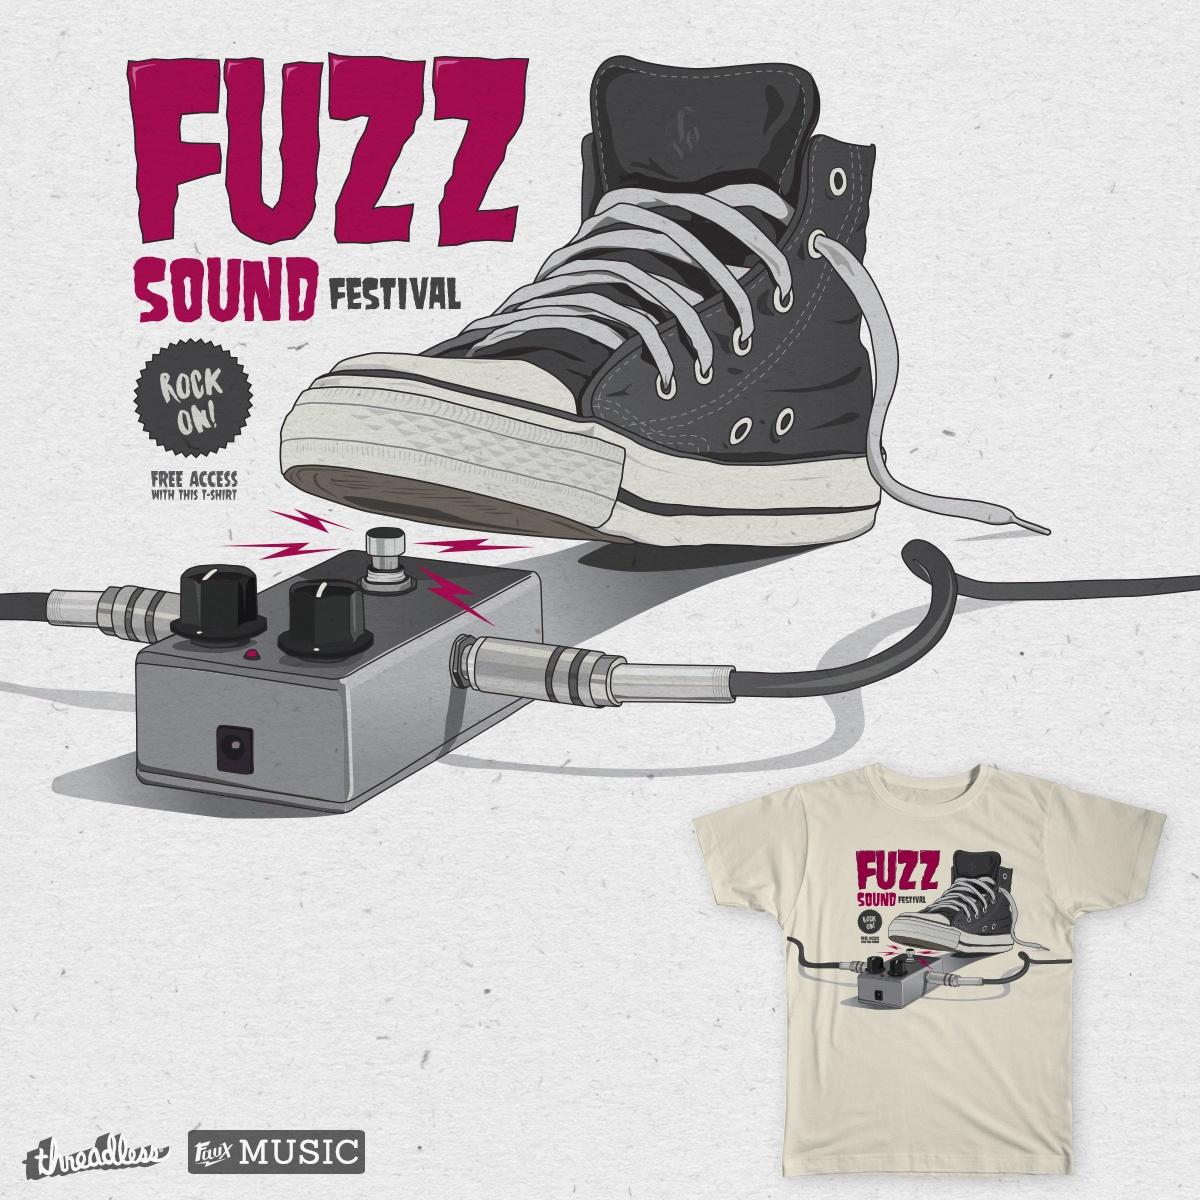 Fuzz Sound Festival by Luis Olivares on Threadless